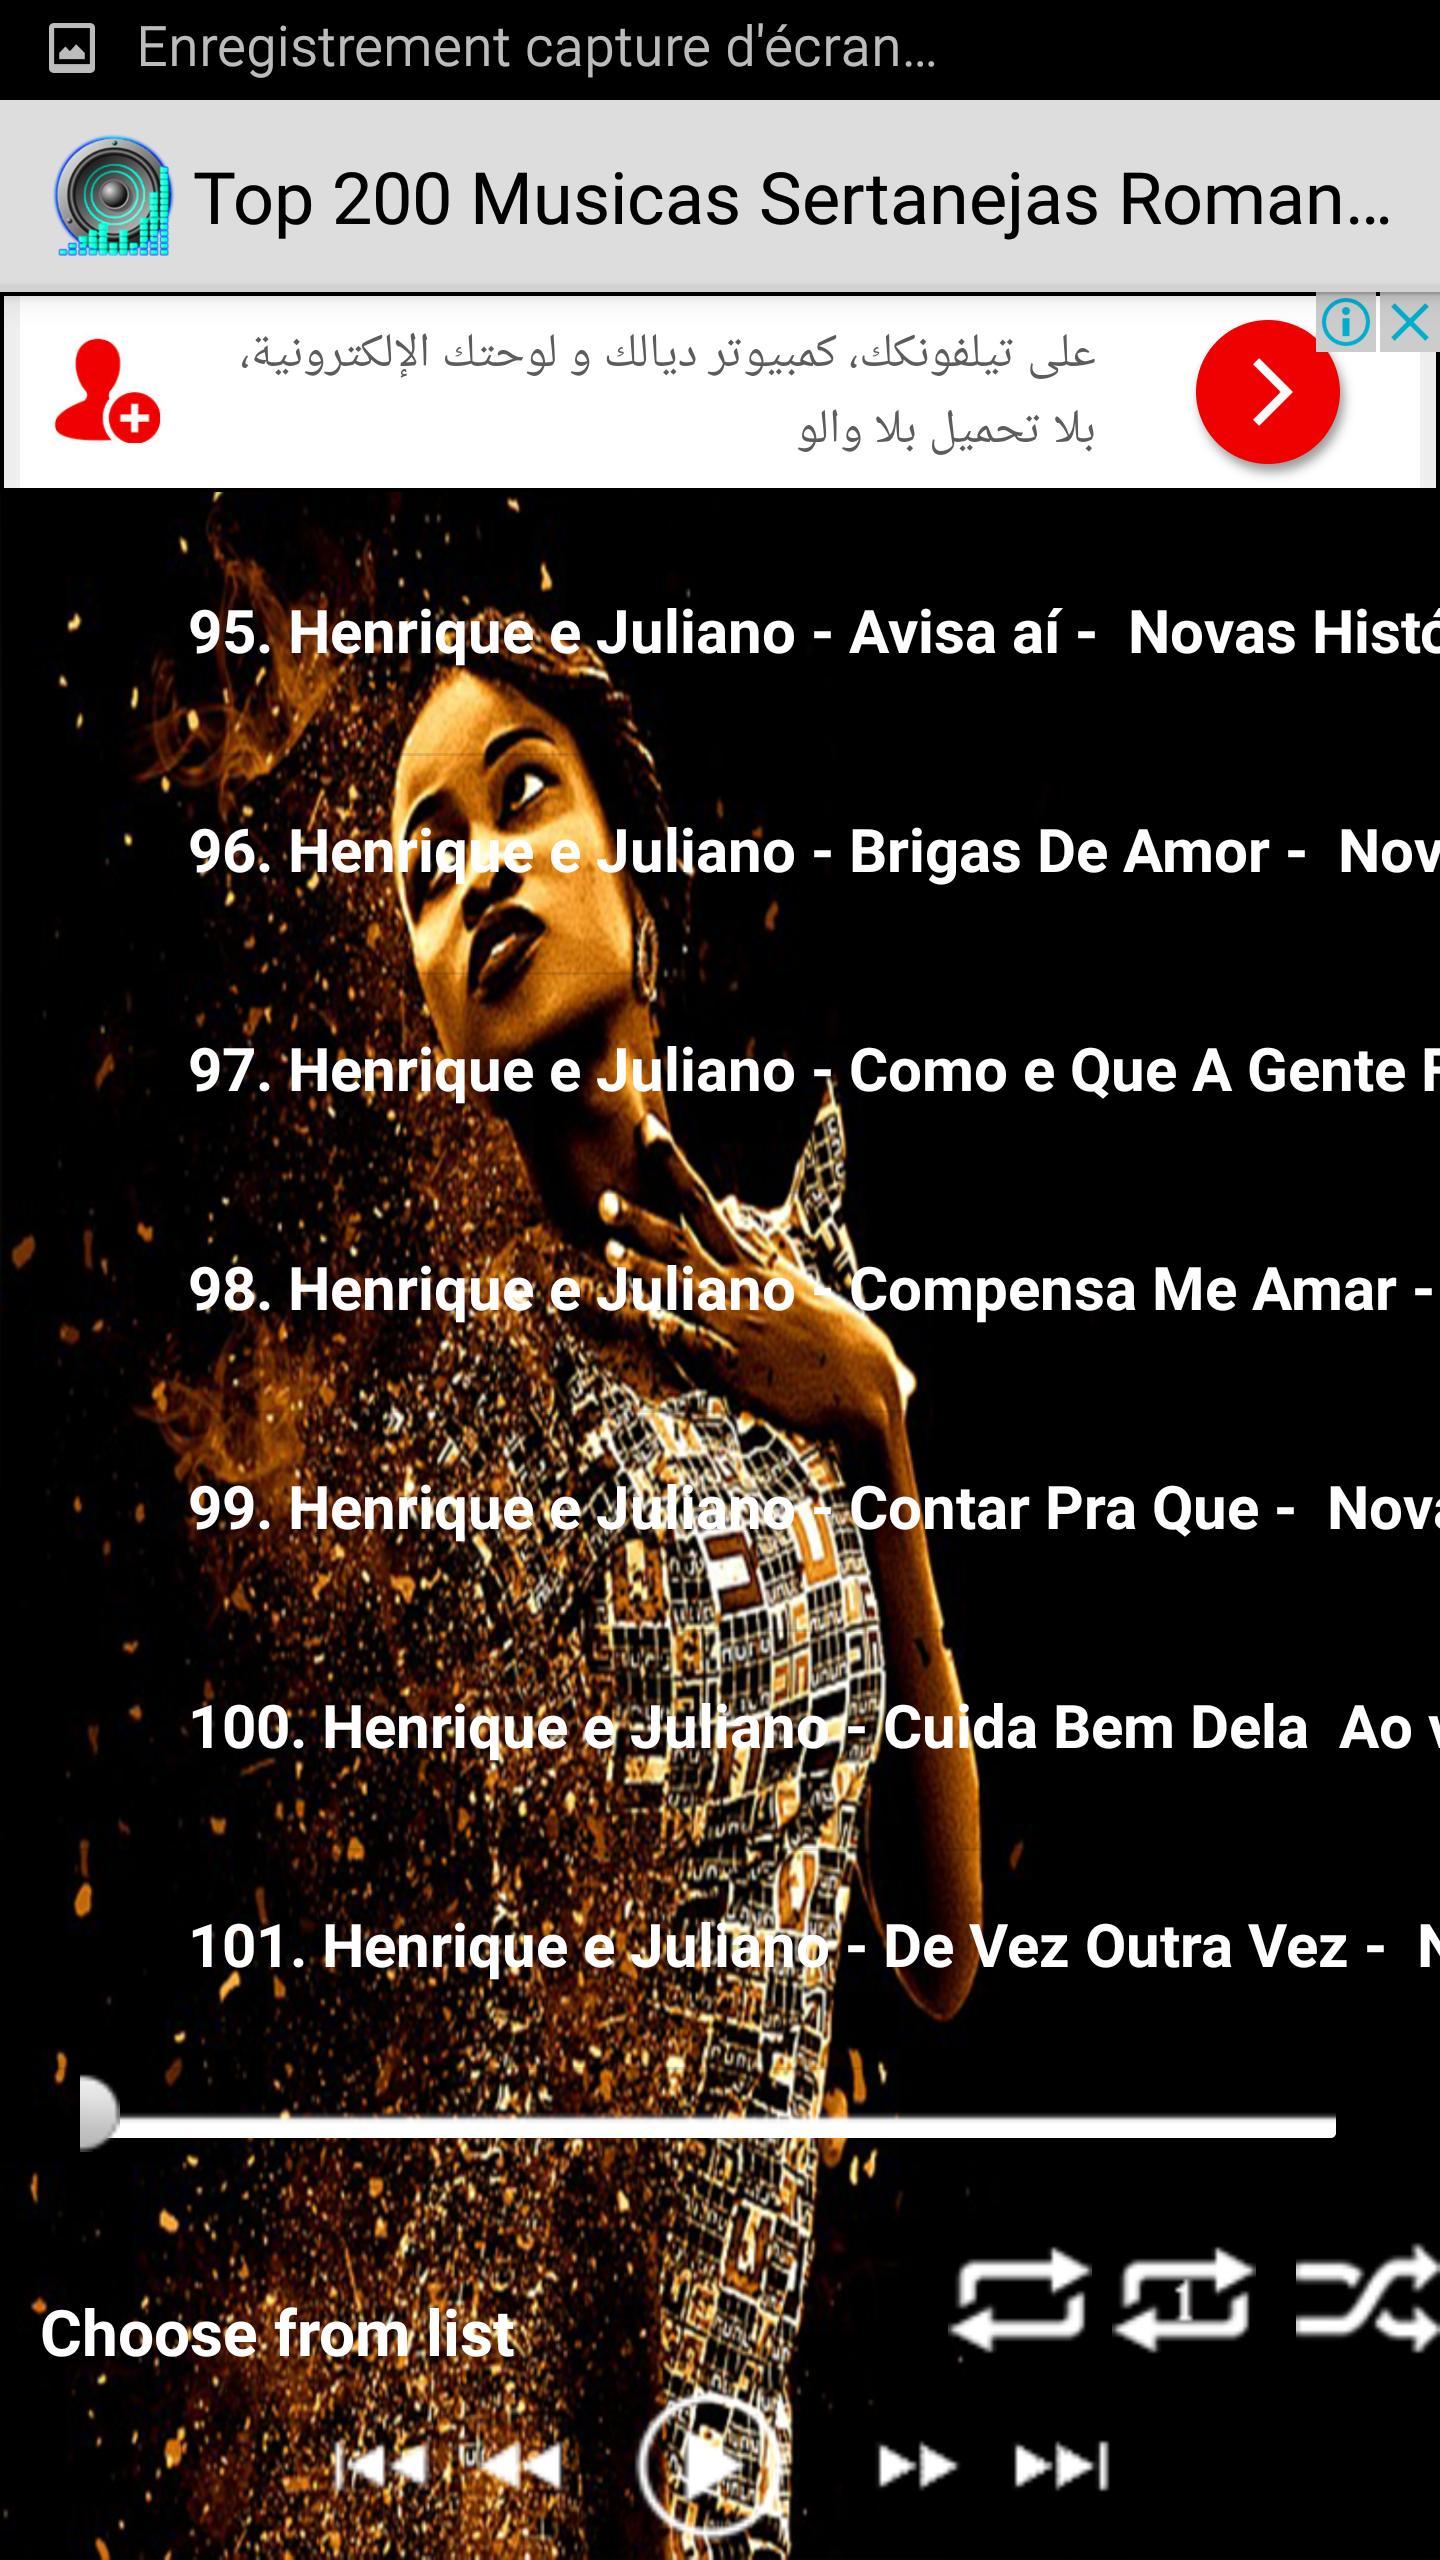 Amor meia boca (acústico) by daniel e cristiano & sertanejo play.